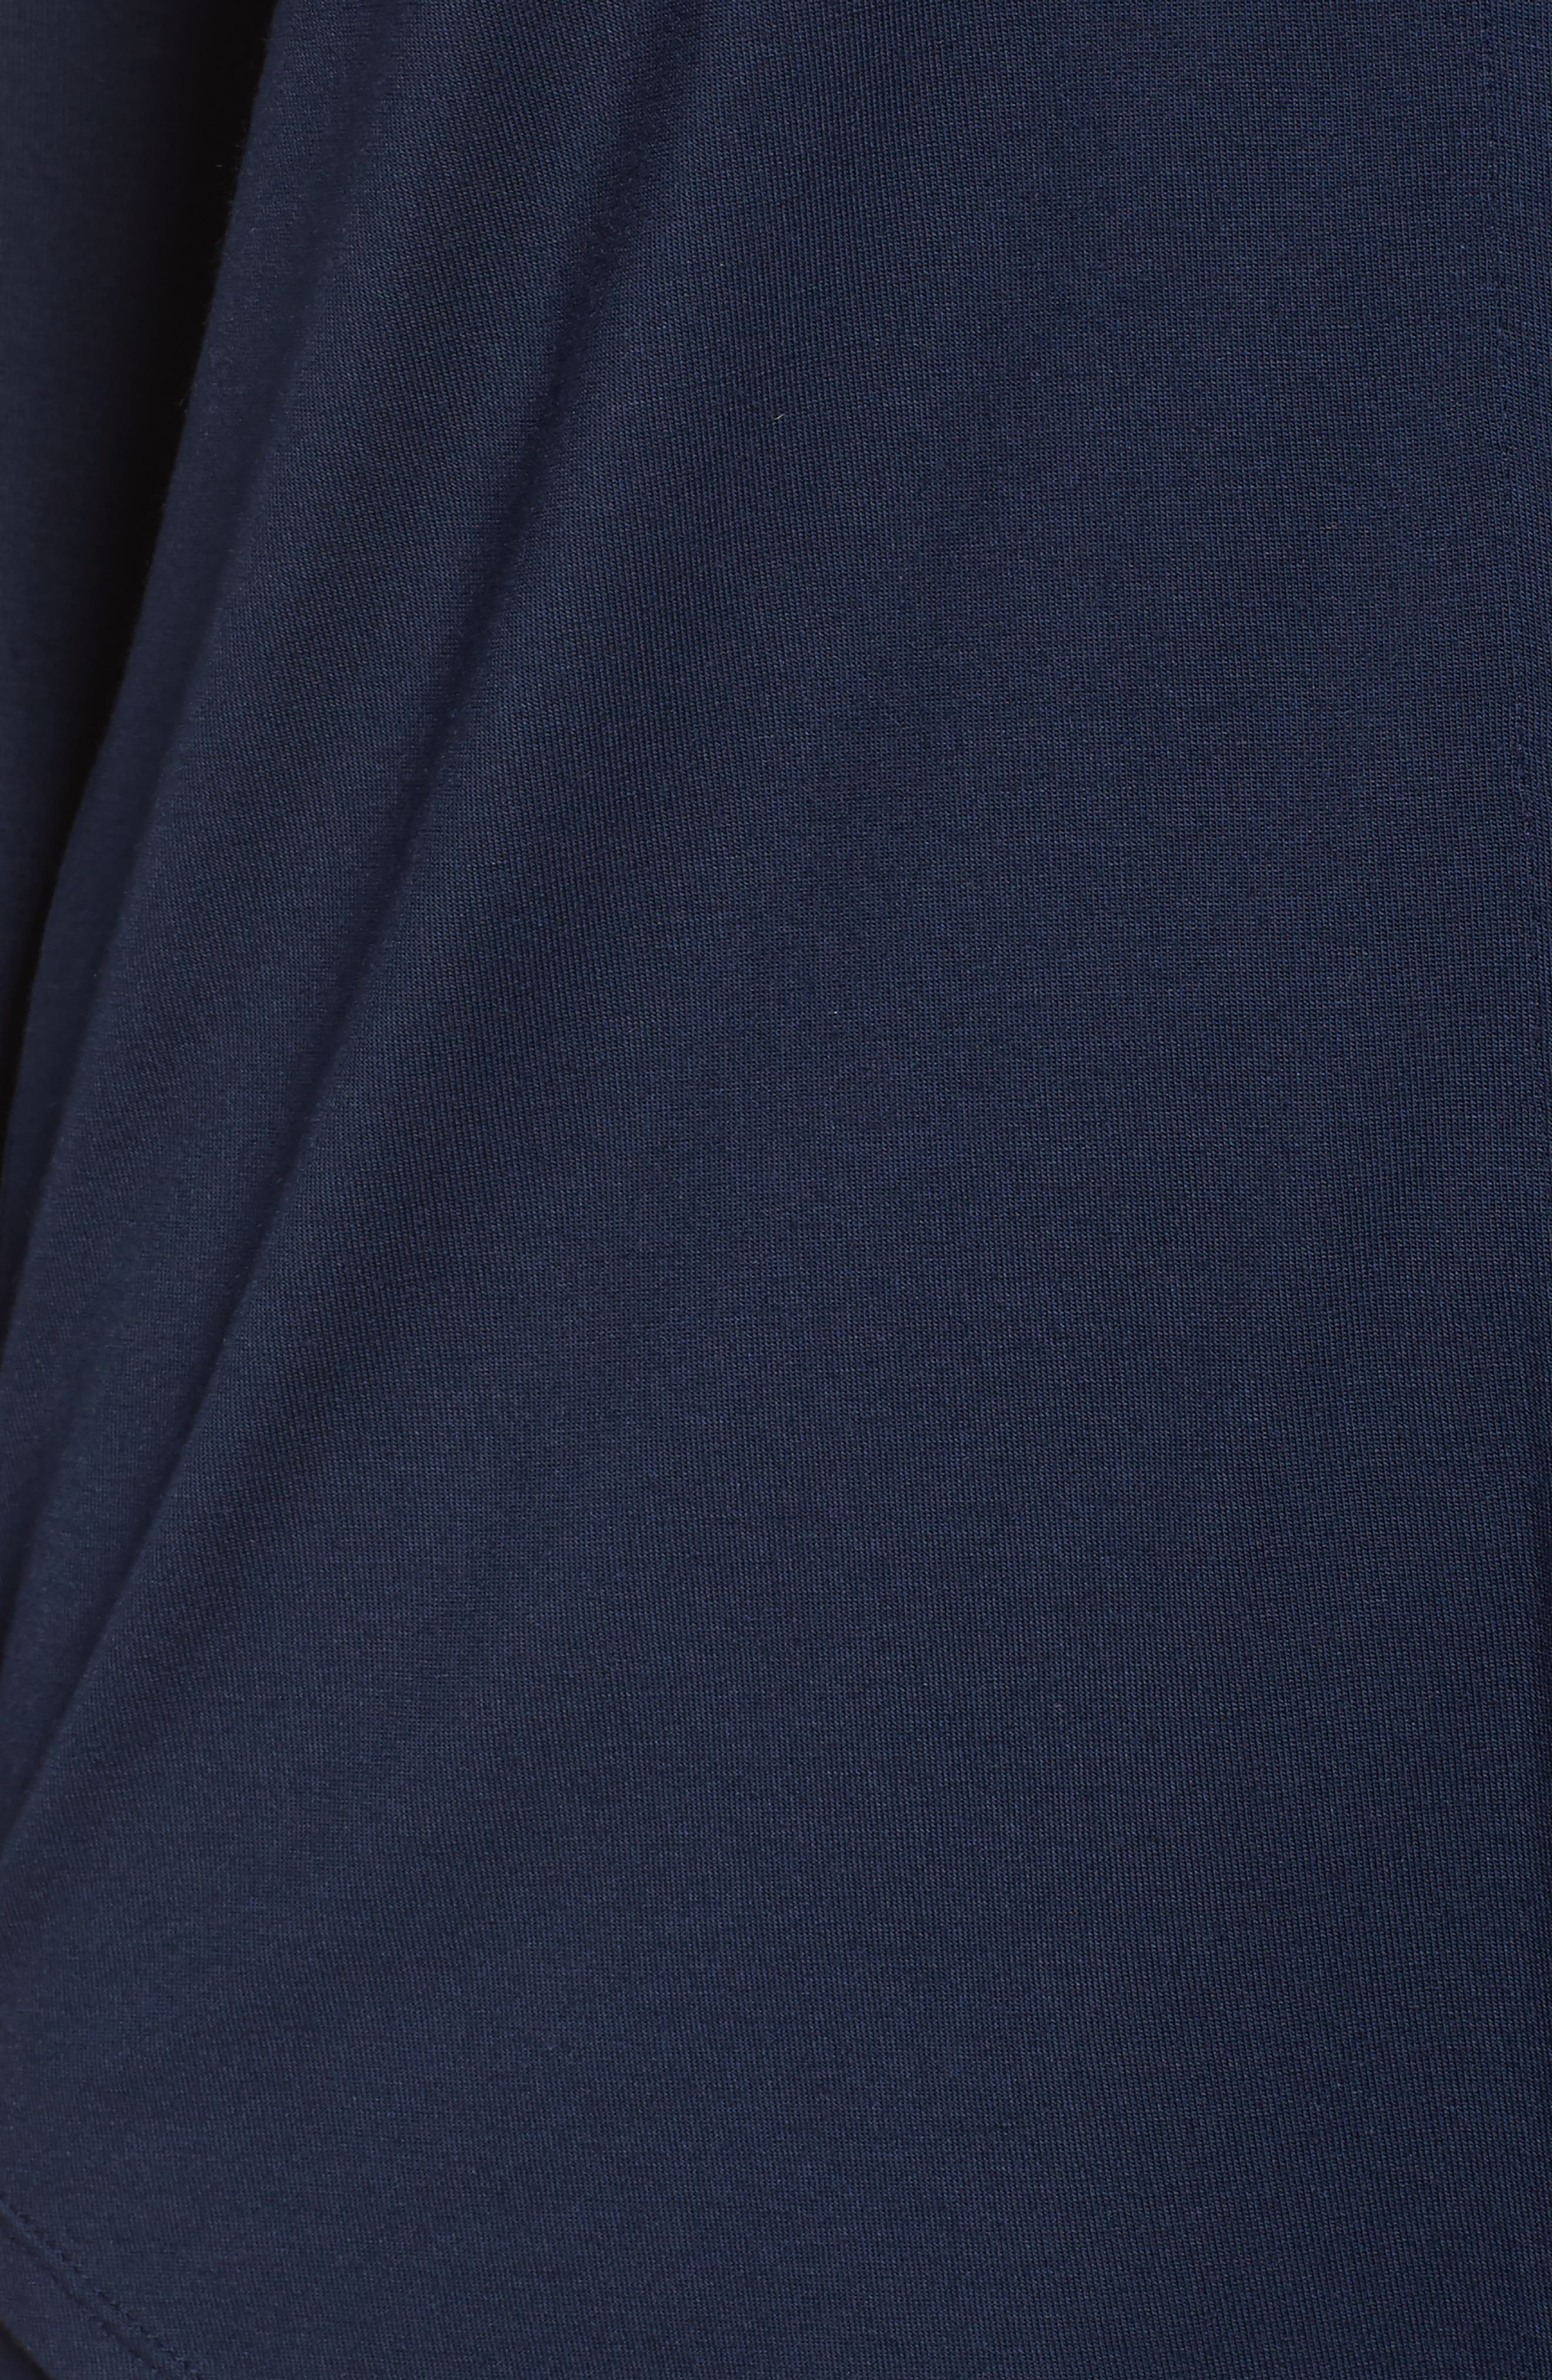 LAUREN RALPH LAUREN, Jersey Pajamas, Alternate thumbnail 5, color, SPRING NAVY